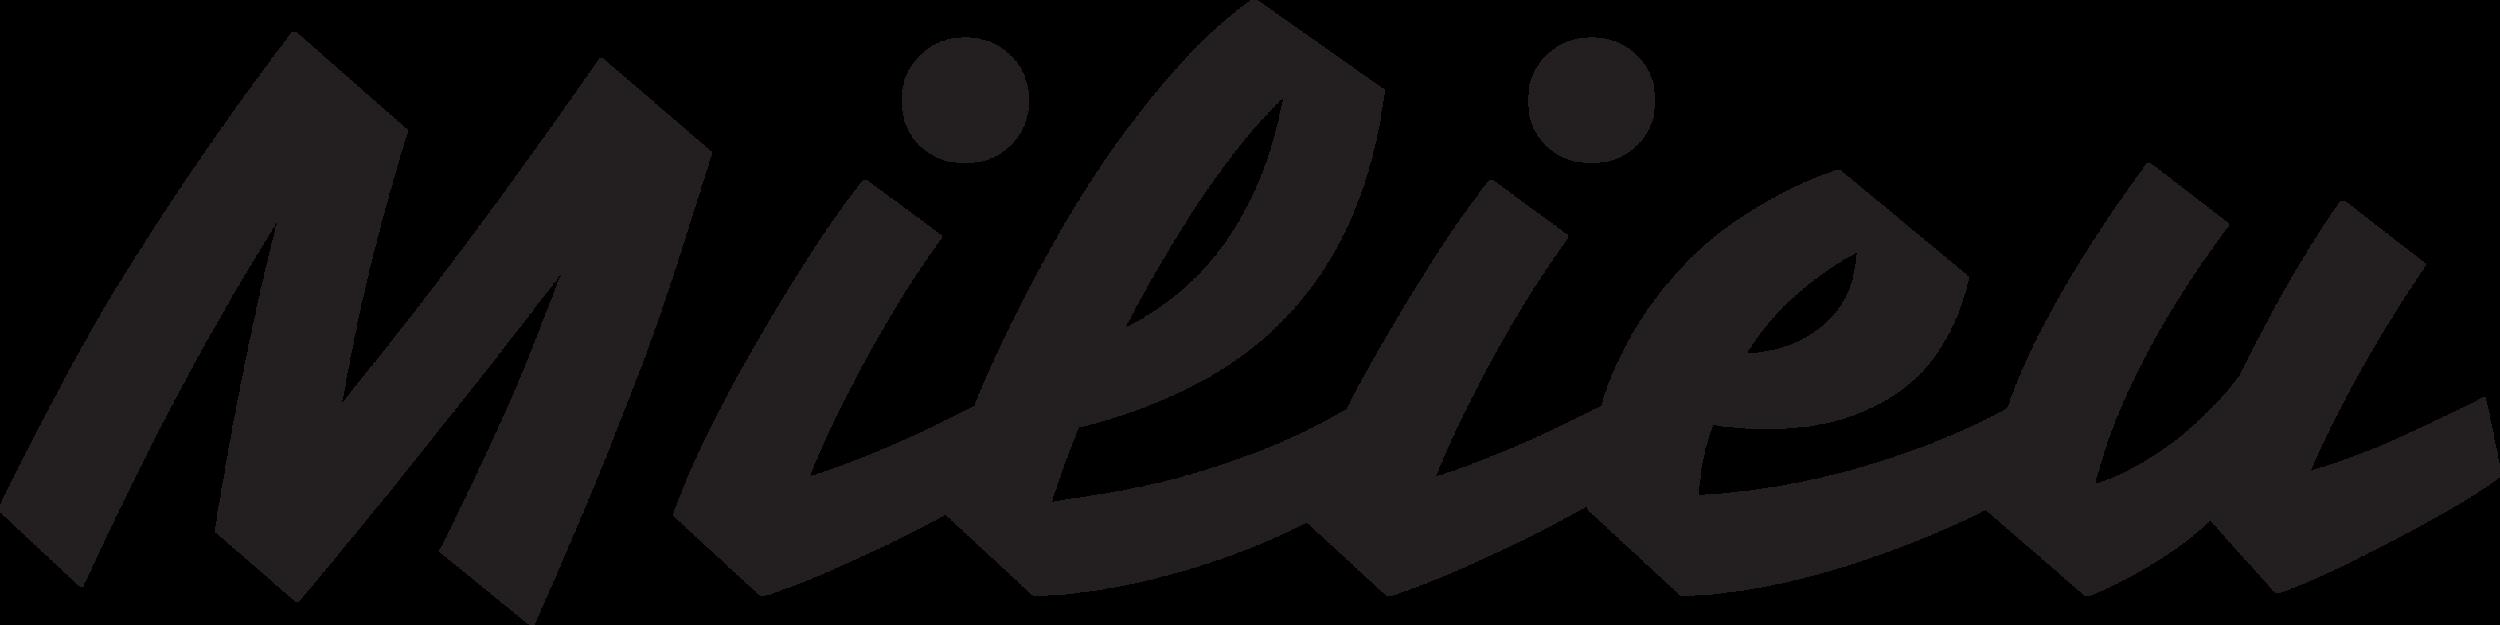 Milieu_Logo_Schwarz_CMYK.png